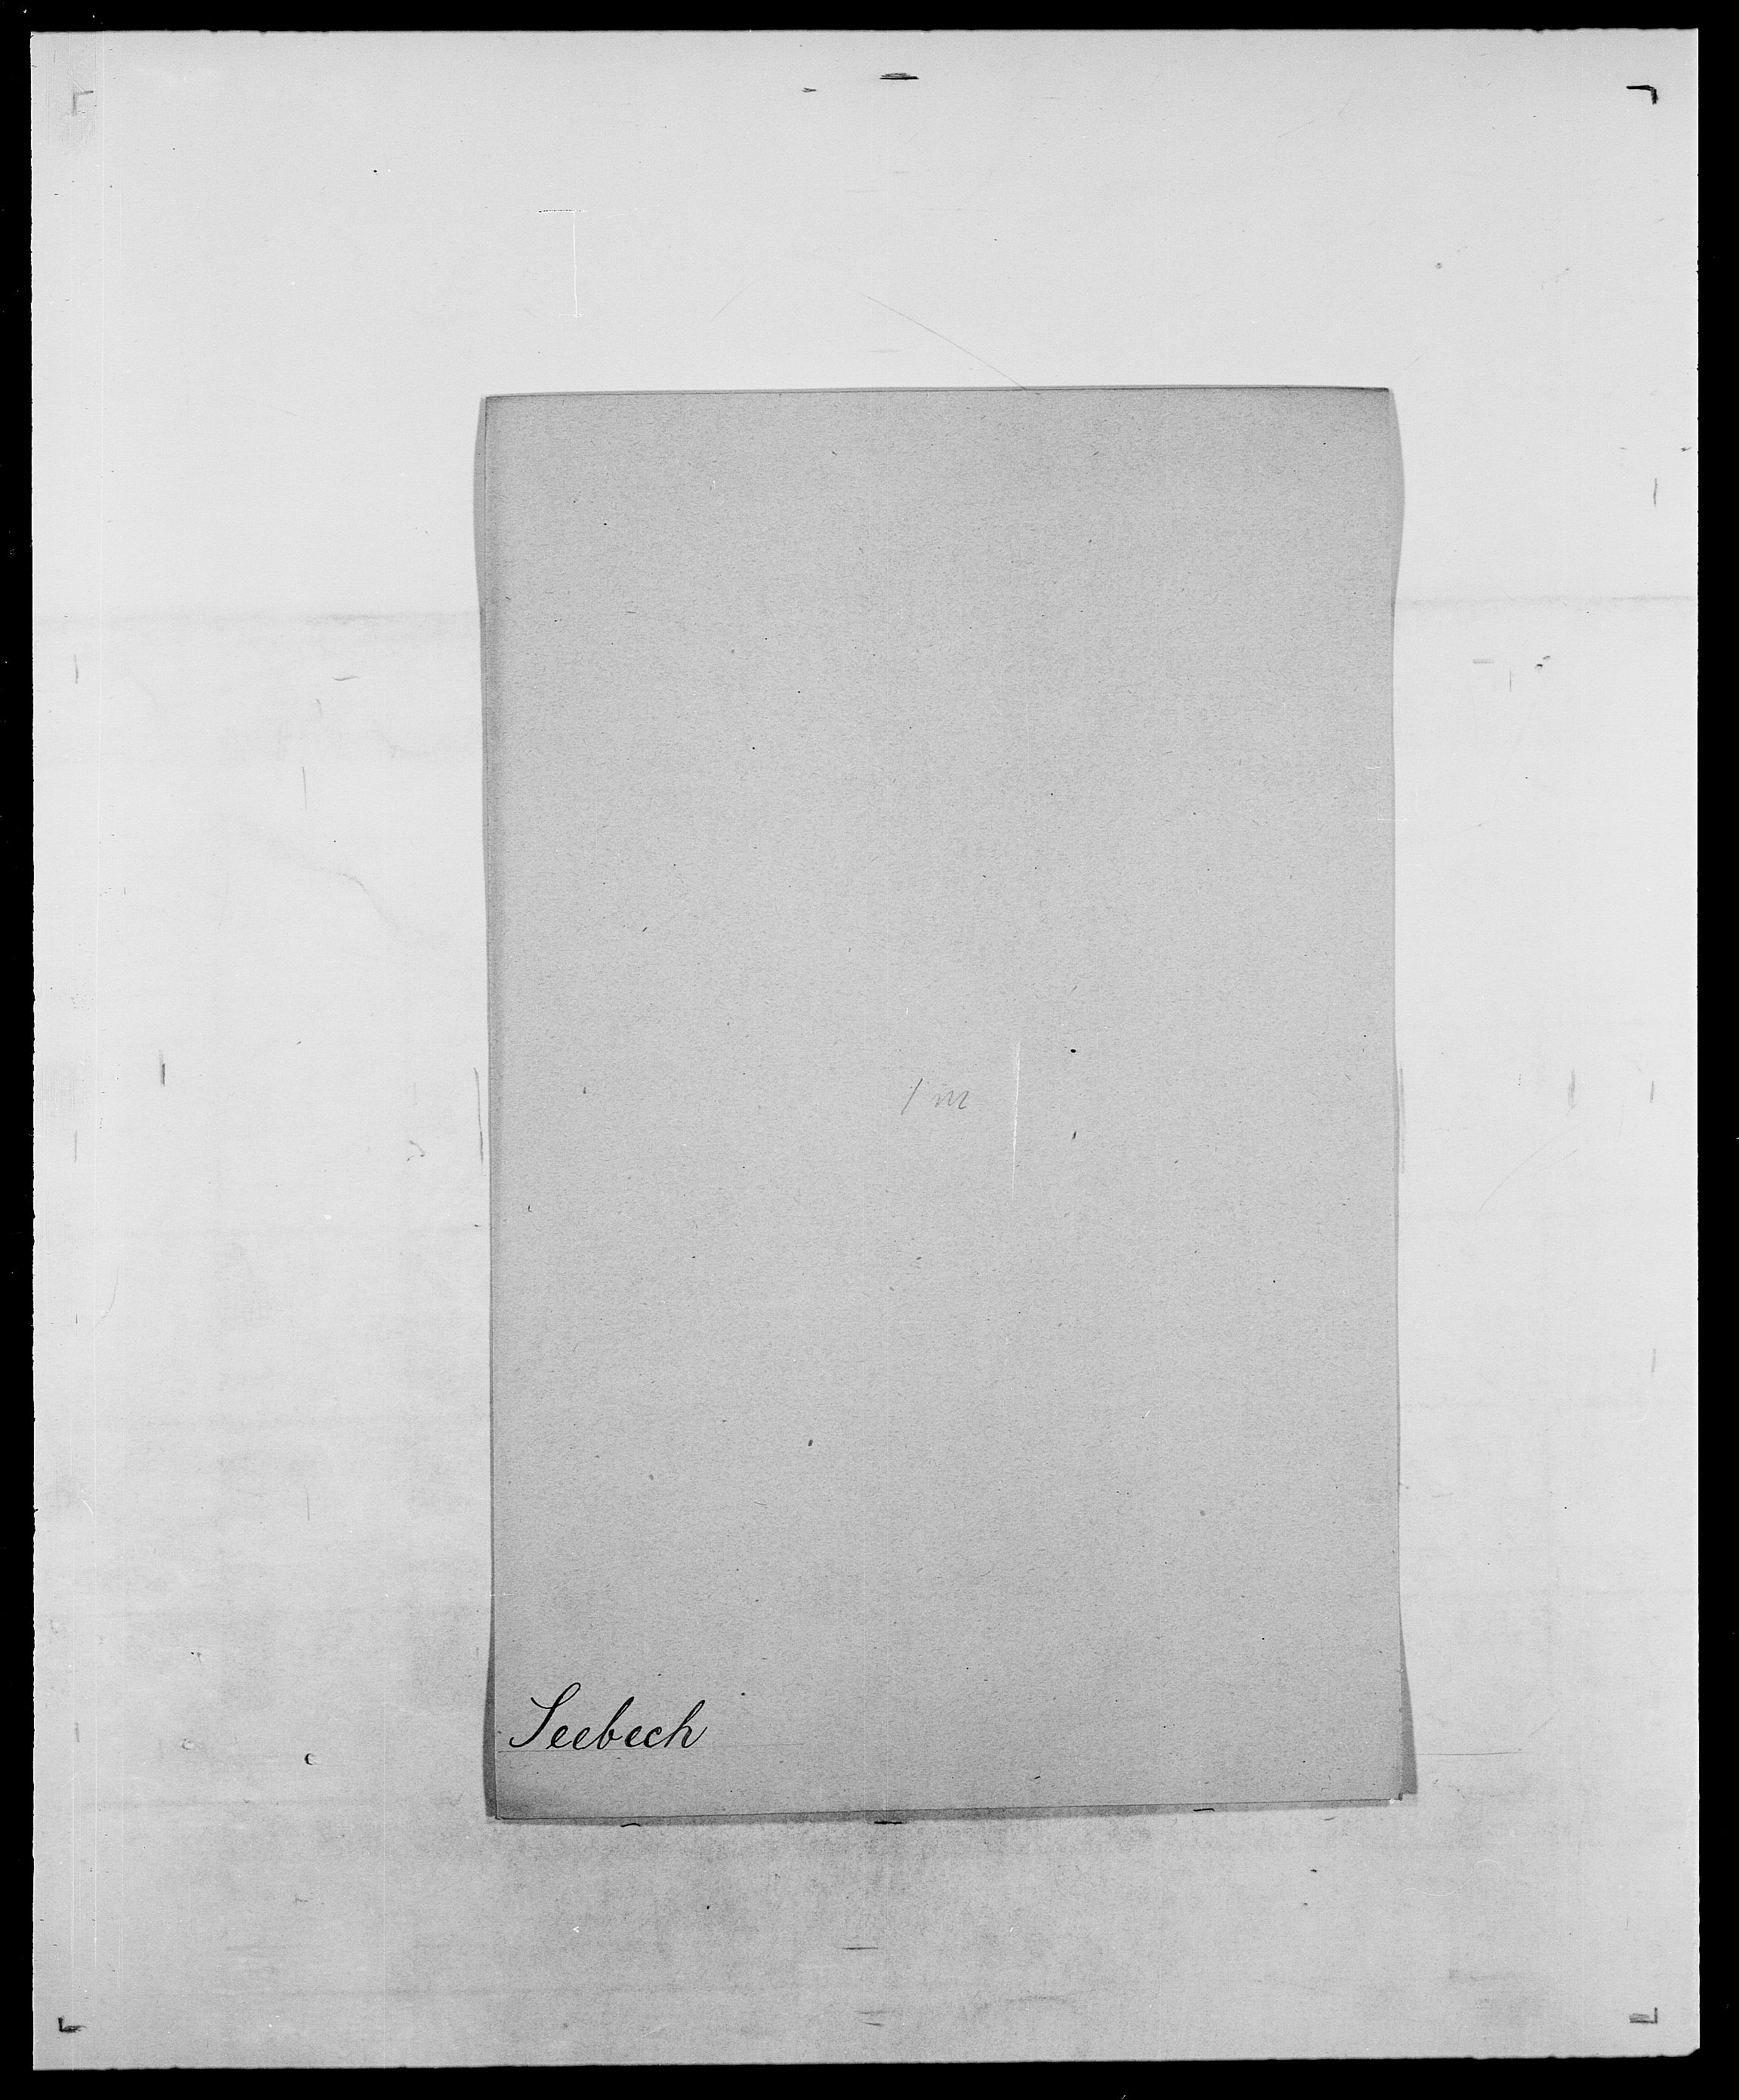 SAO, Delgobe, Charles Antoine - samling, D/Da/L0035: Schnabel - sjetman, s. 528